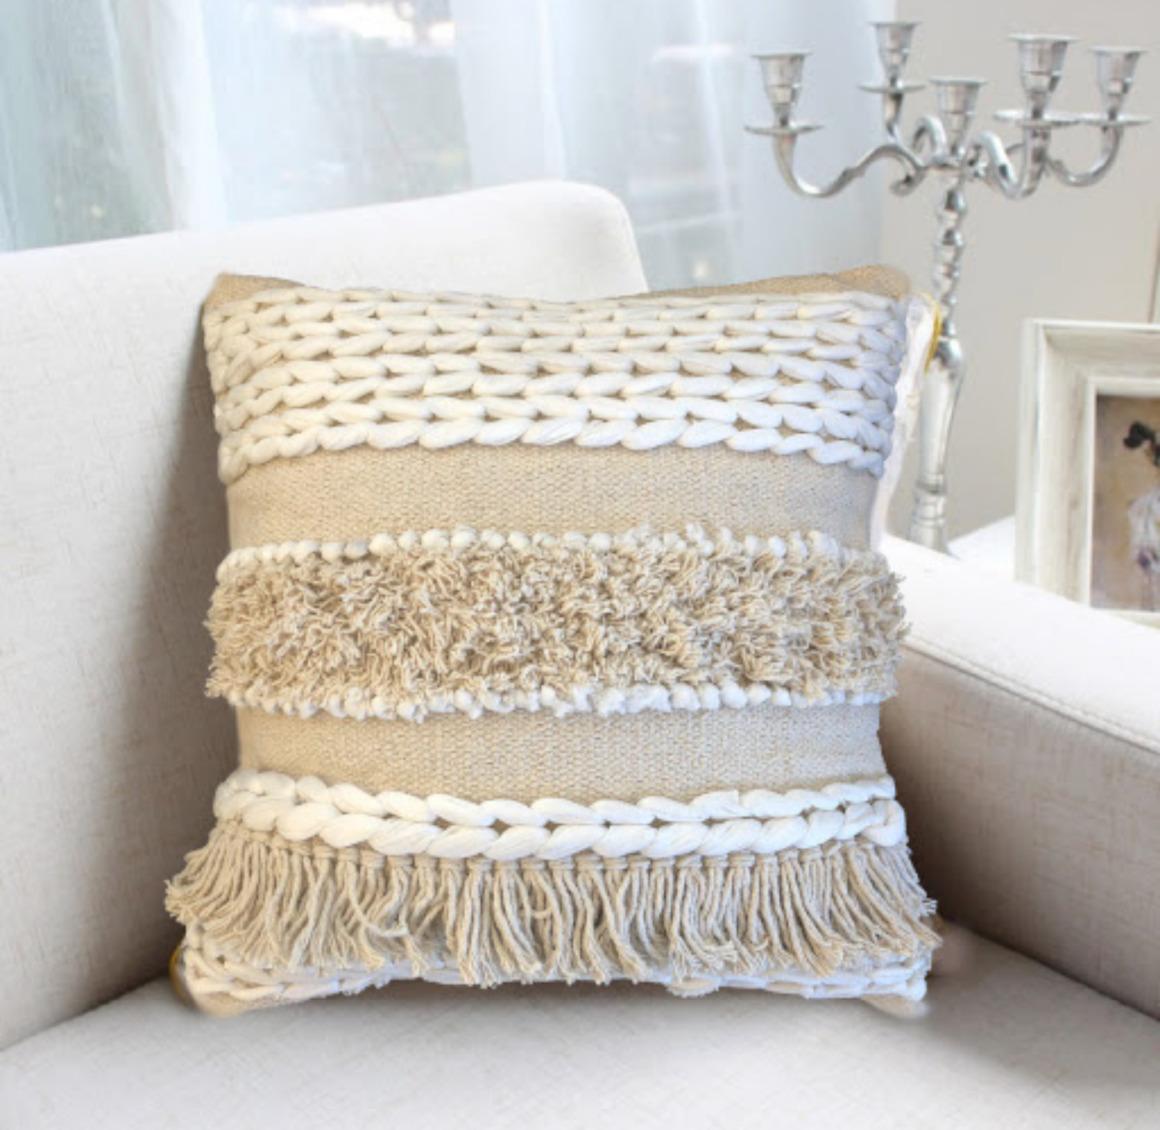 Ābhā Handmade Decorative BOHO Textured tufted Cushions Cover with Tassels | Trada Marketplace